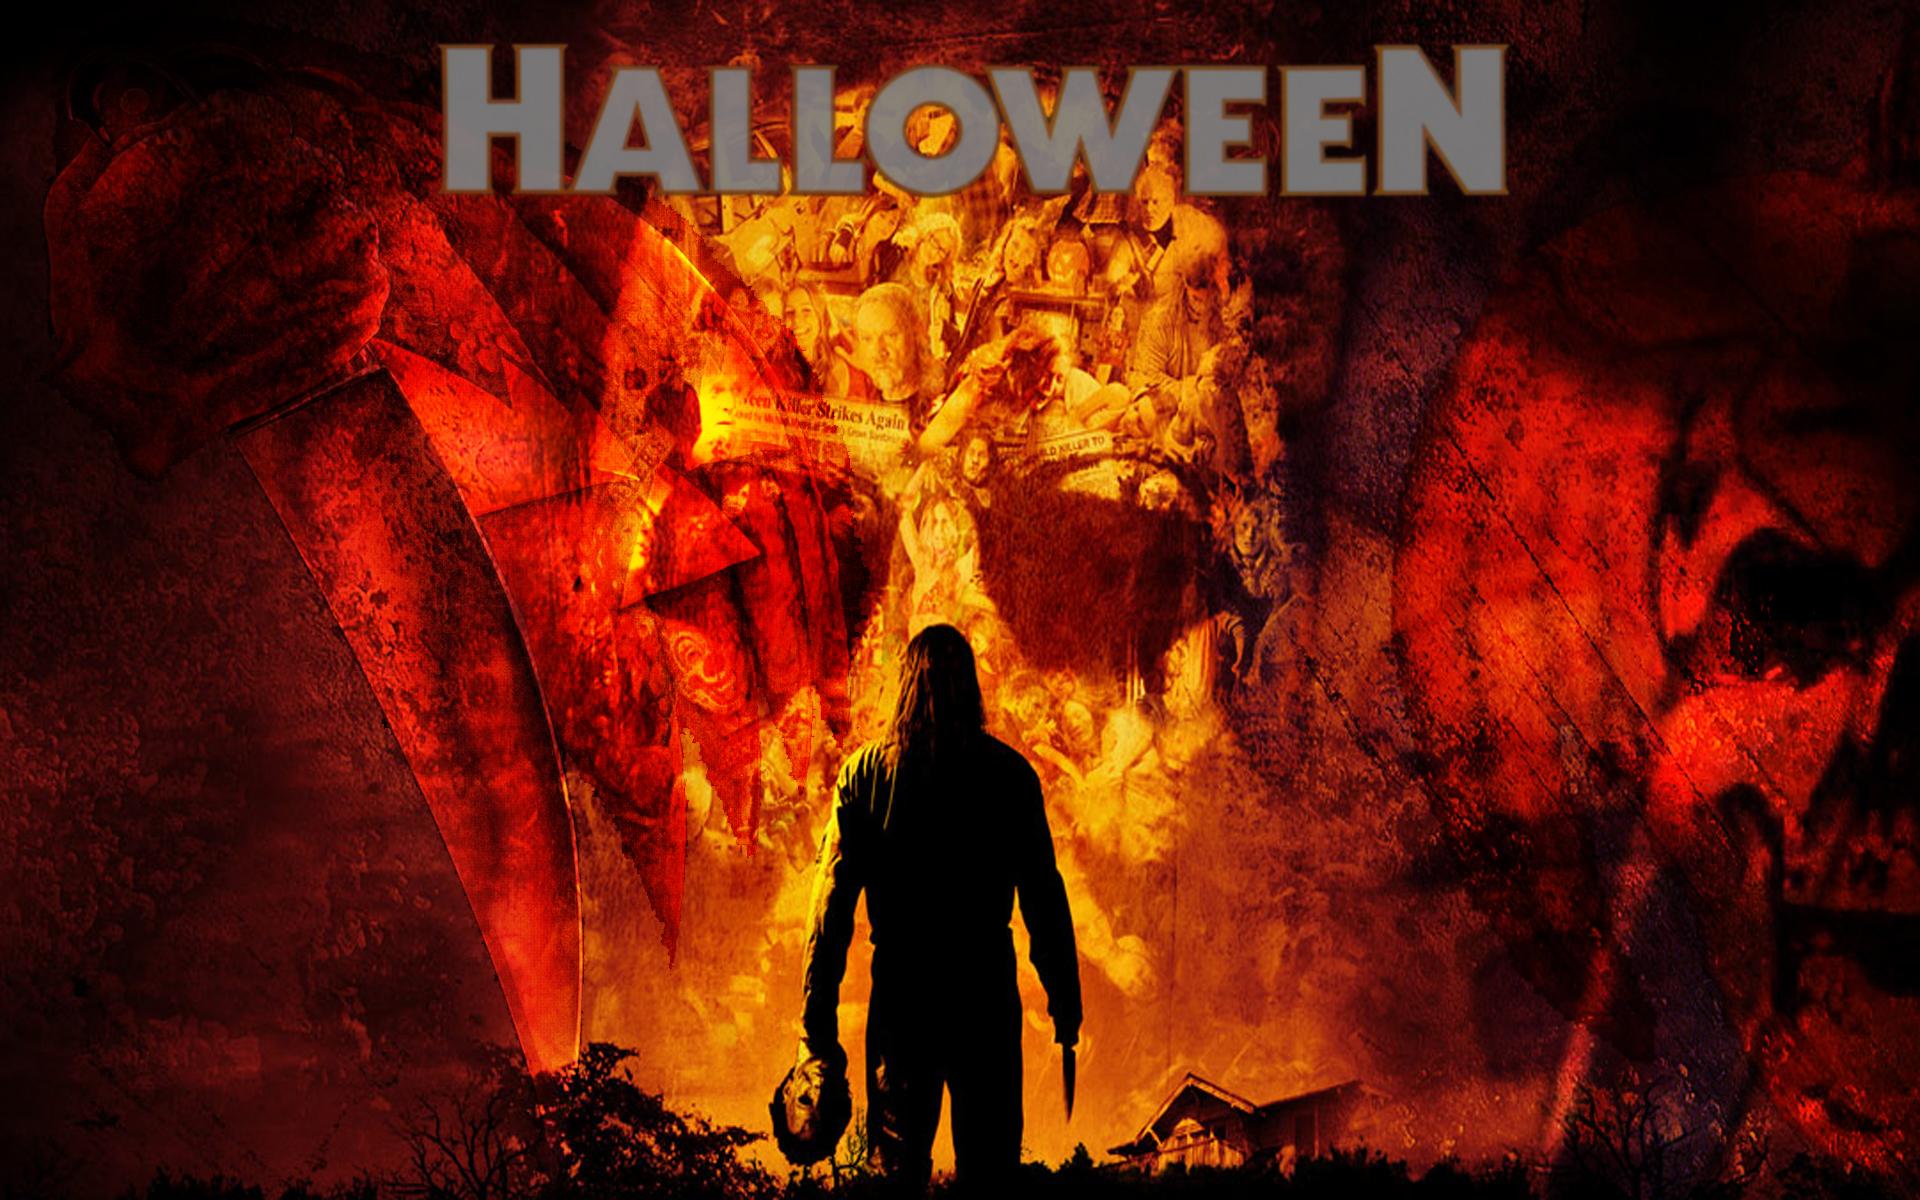 Halloween 2007 Hd Wallpaper Background Image 1920x1200